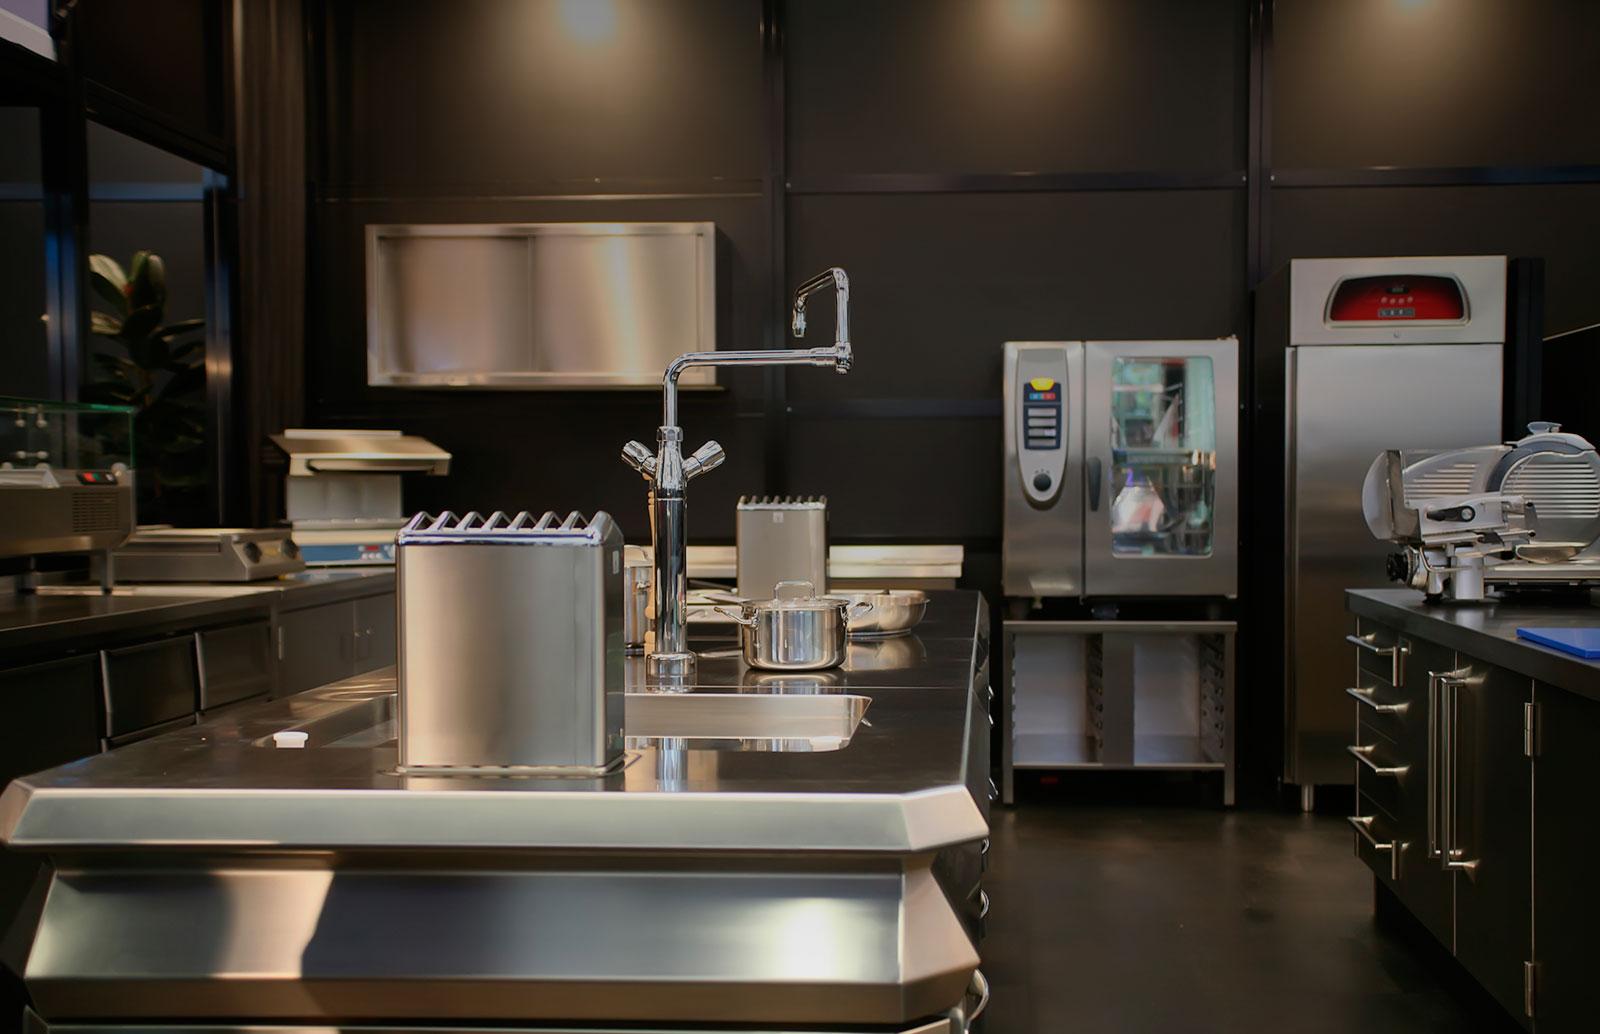 Maquinaria de hosteler a cocina industrial e for Ver cocinas industriales